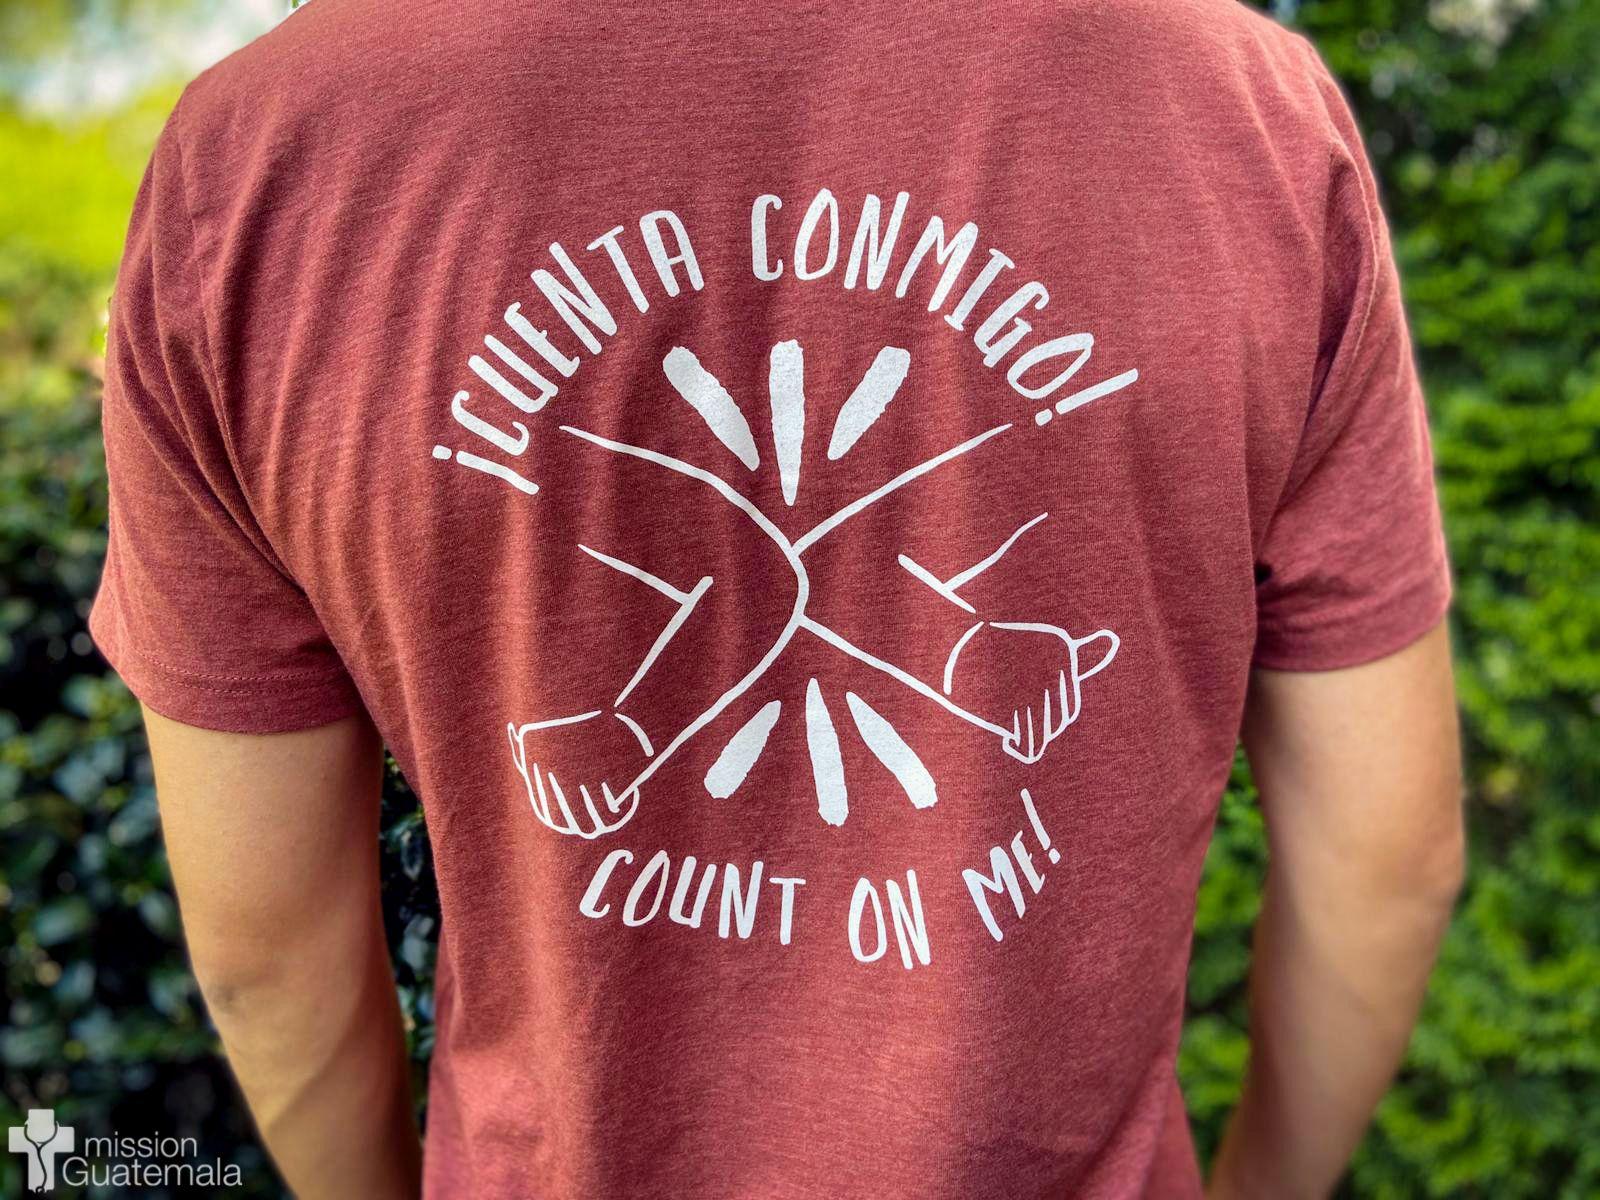 ¡Cuenta Conmigo! Shirts Still Available